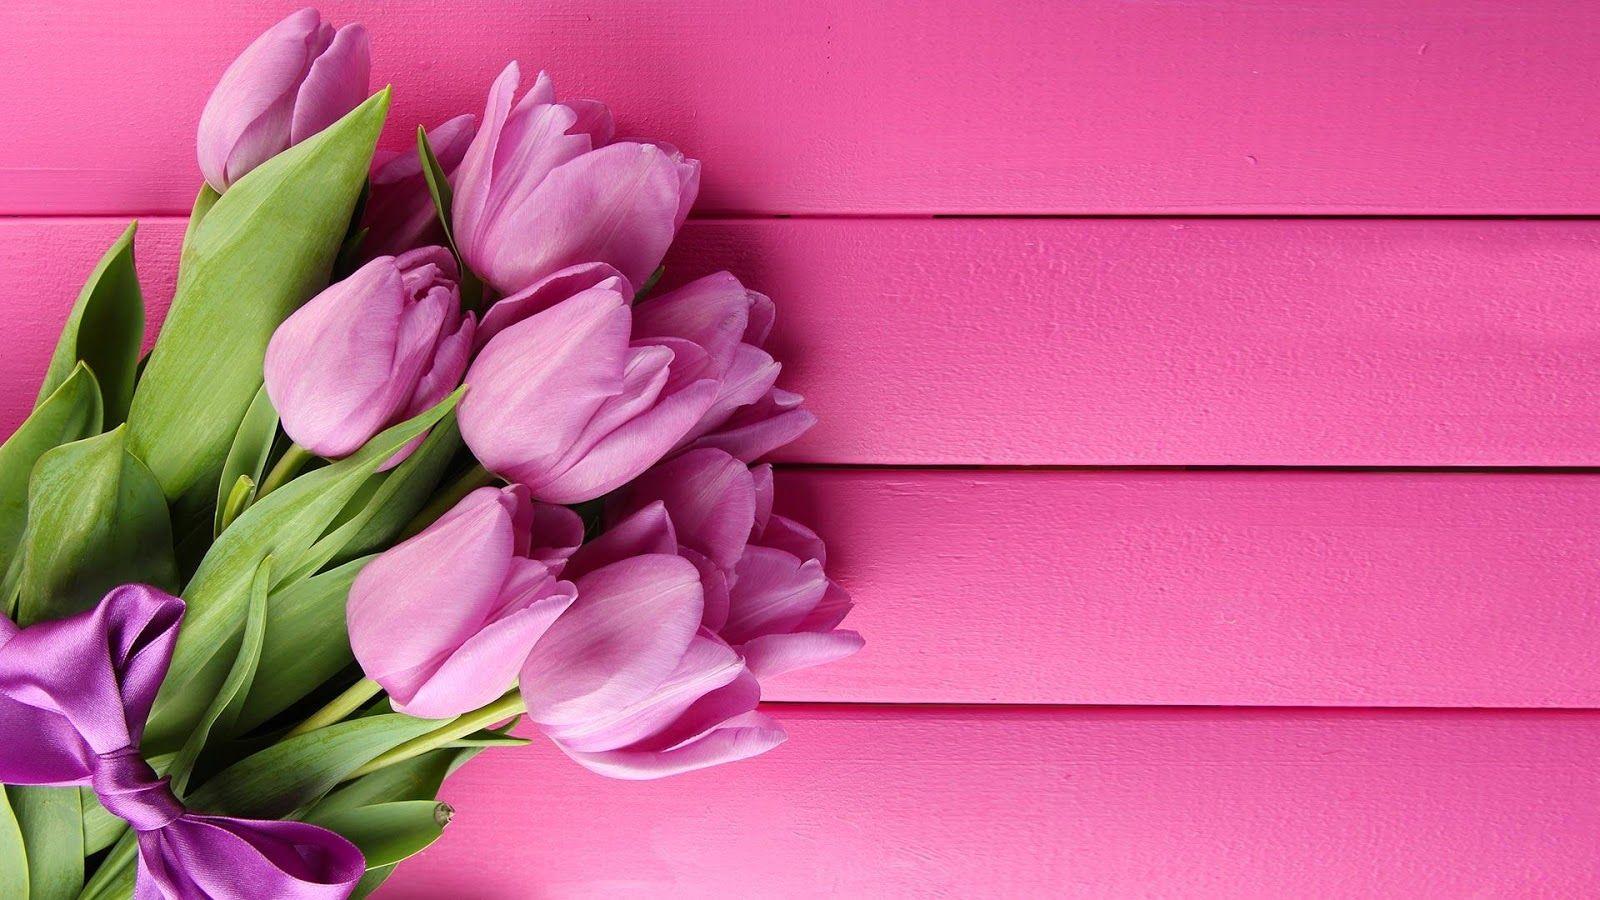 tulip flower pics hd